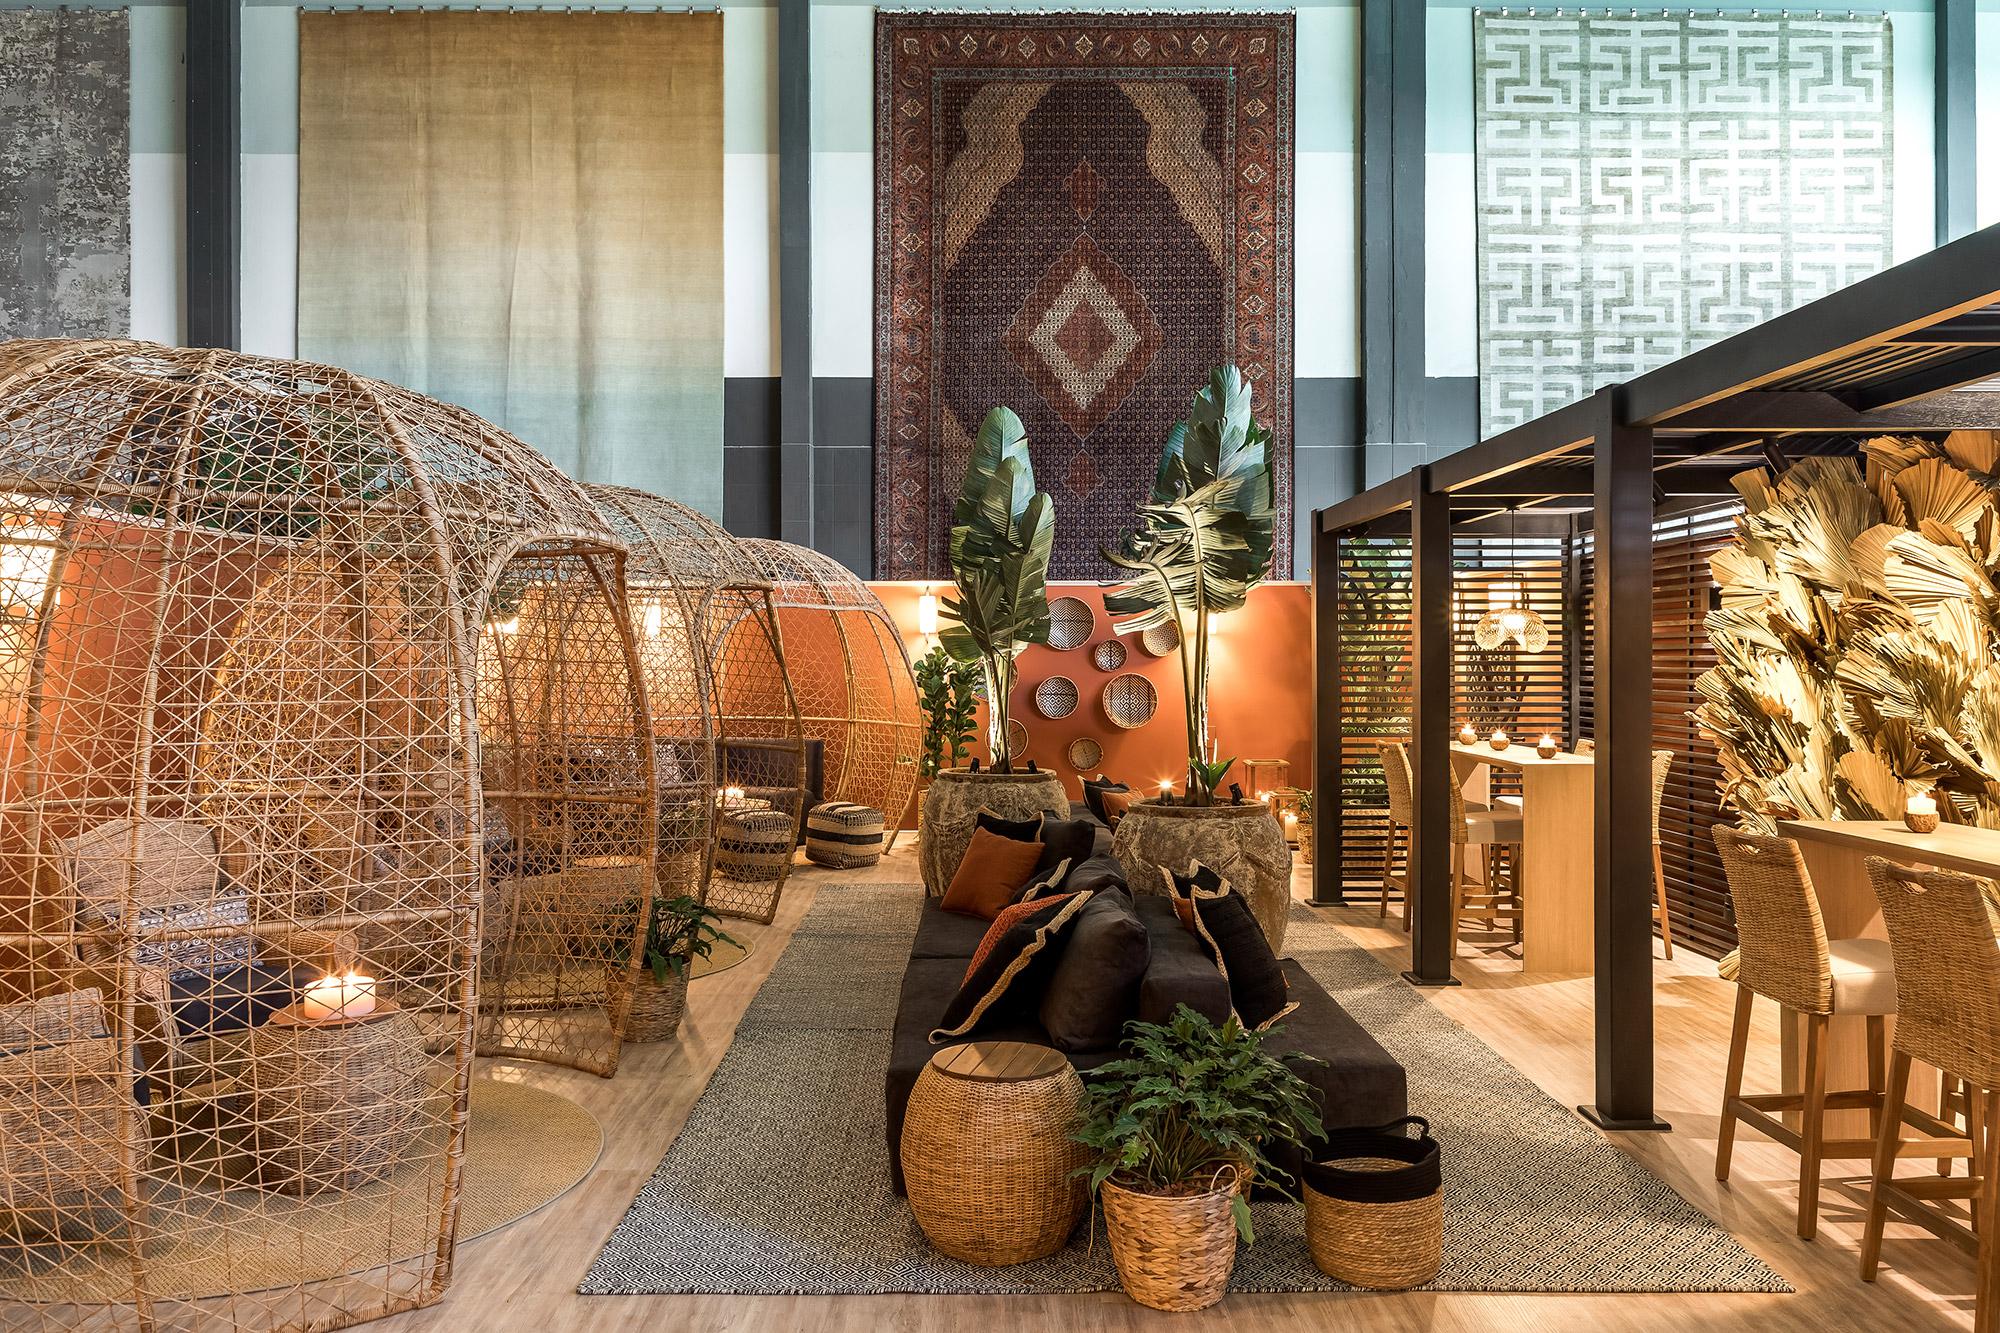 Lounge VIP Viviane Tabalipa CASACOR Paraná 2021 loft sala deco design artesanato